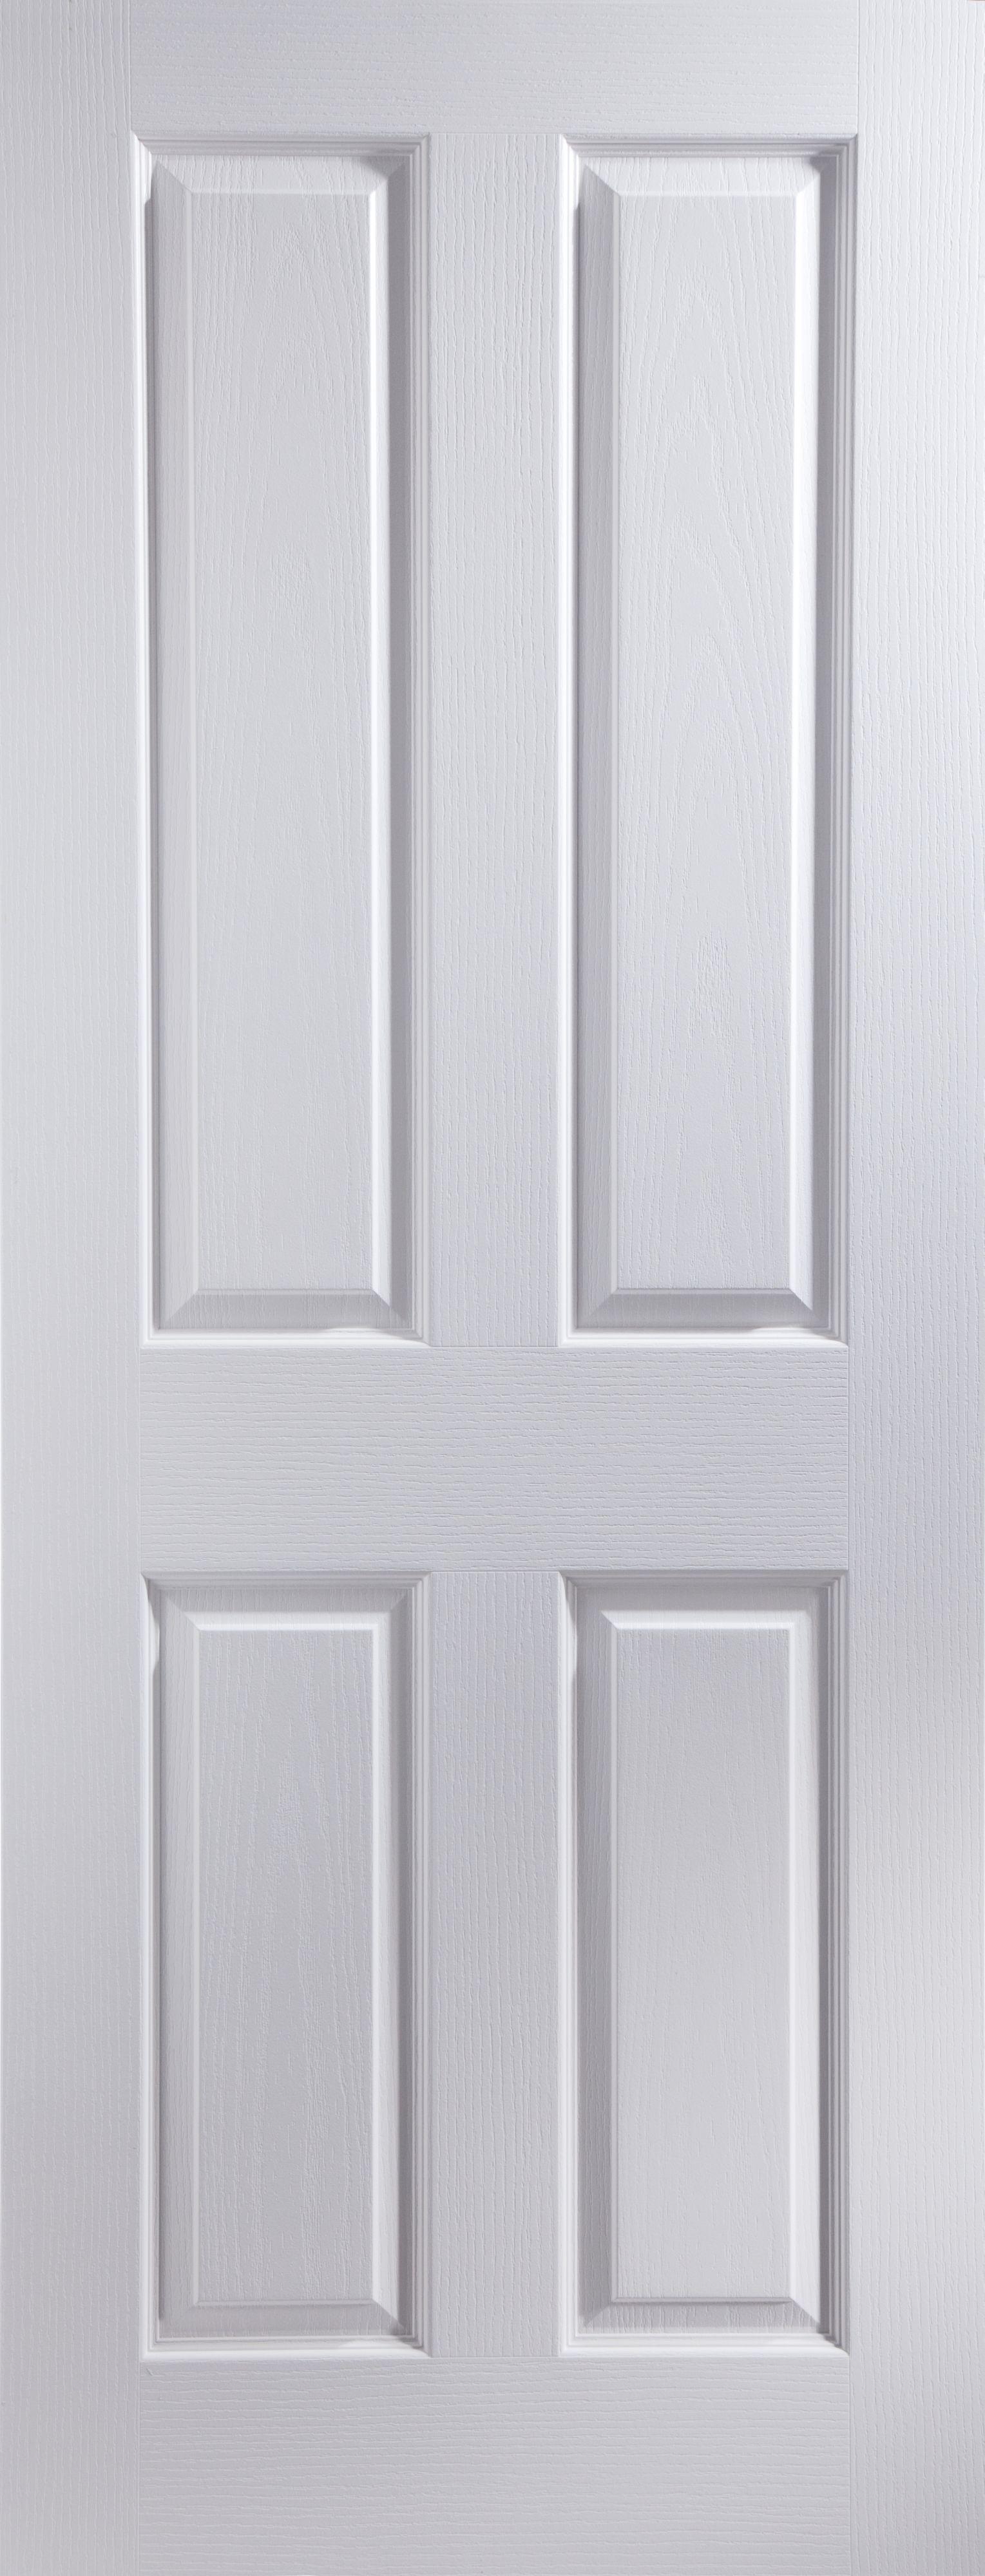 4 Panel White Woodgrain Unglazed Door Kit, (h)2040mm (w)826mm